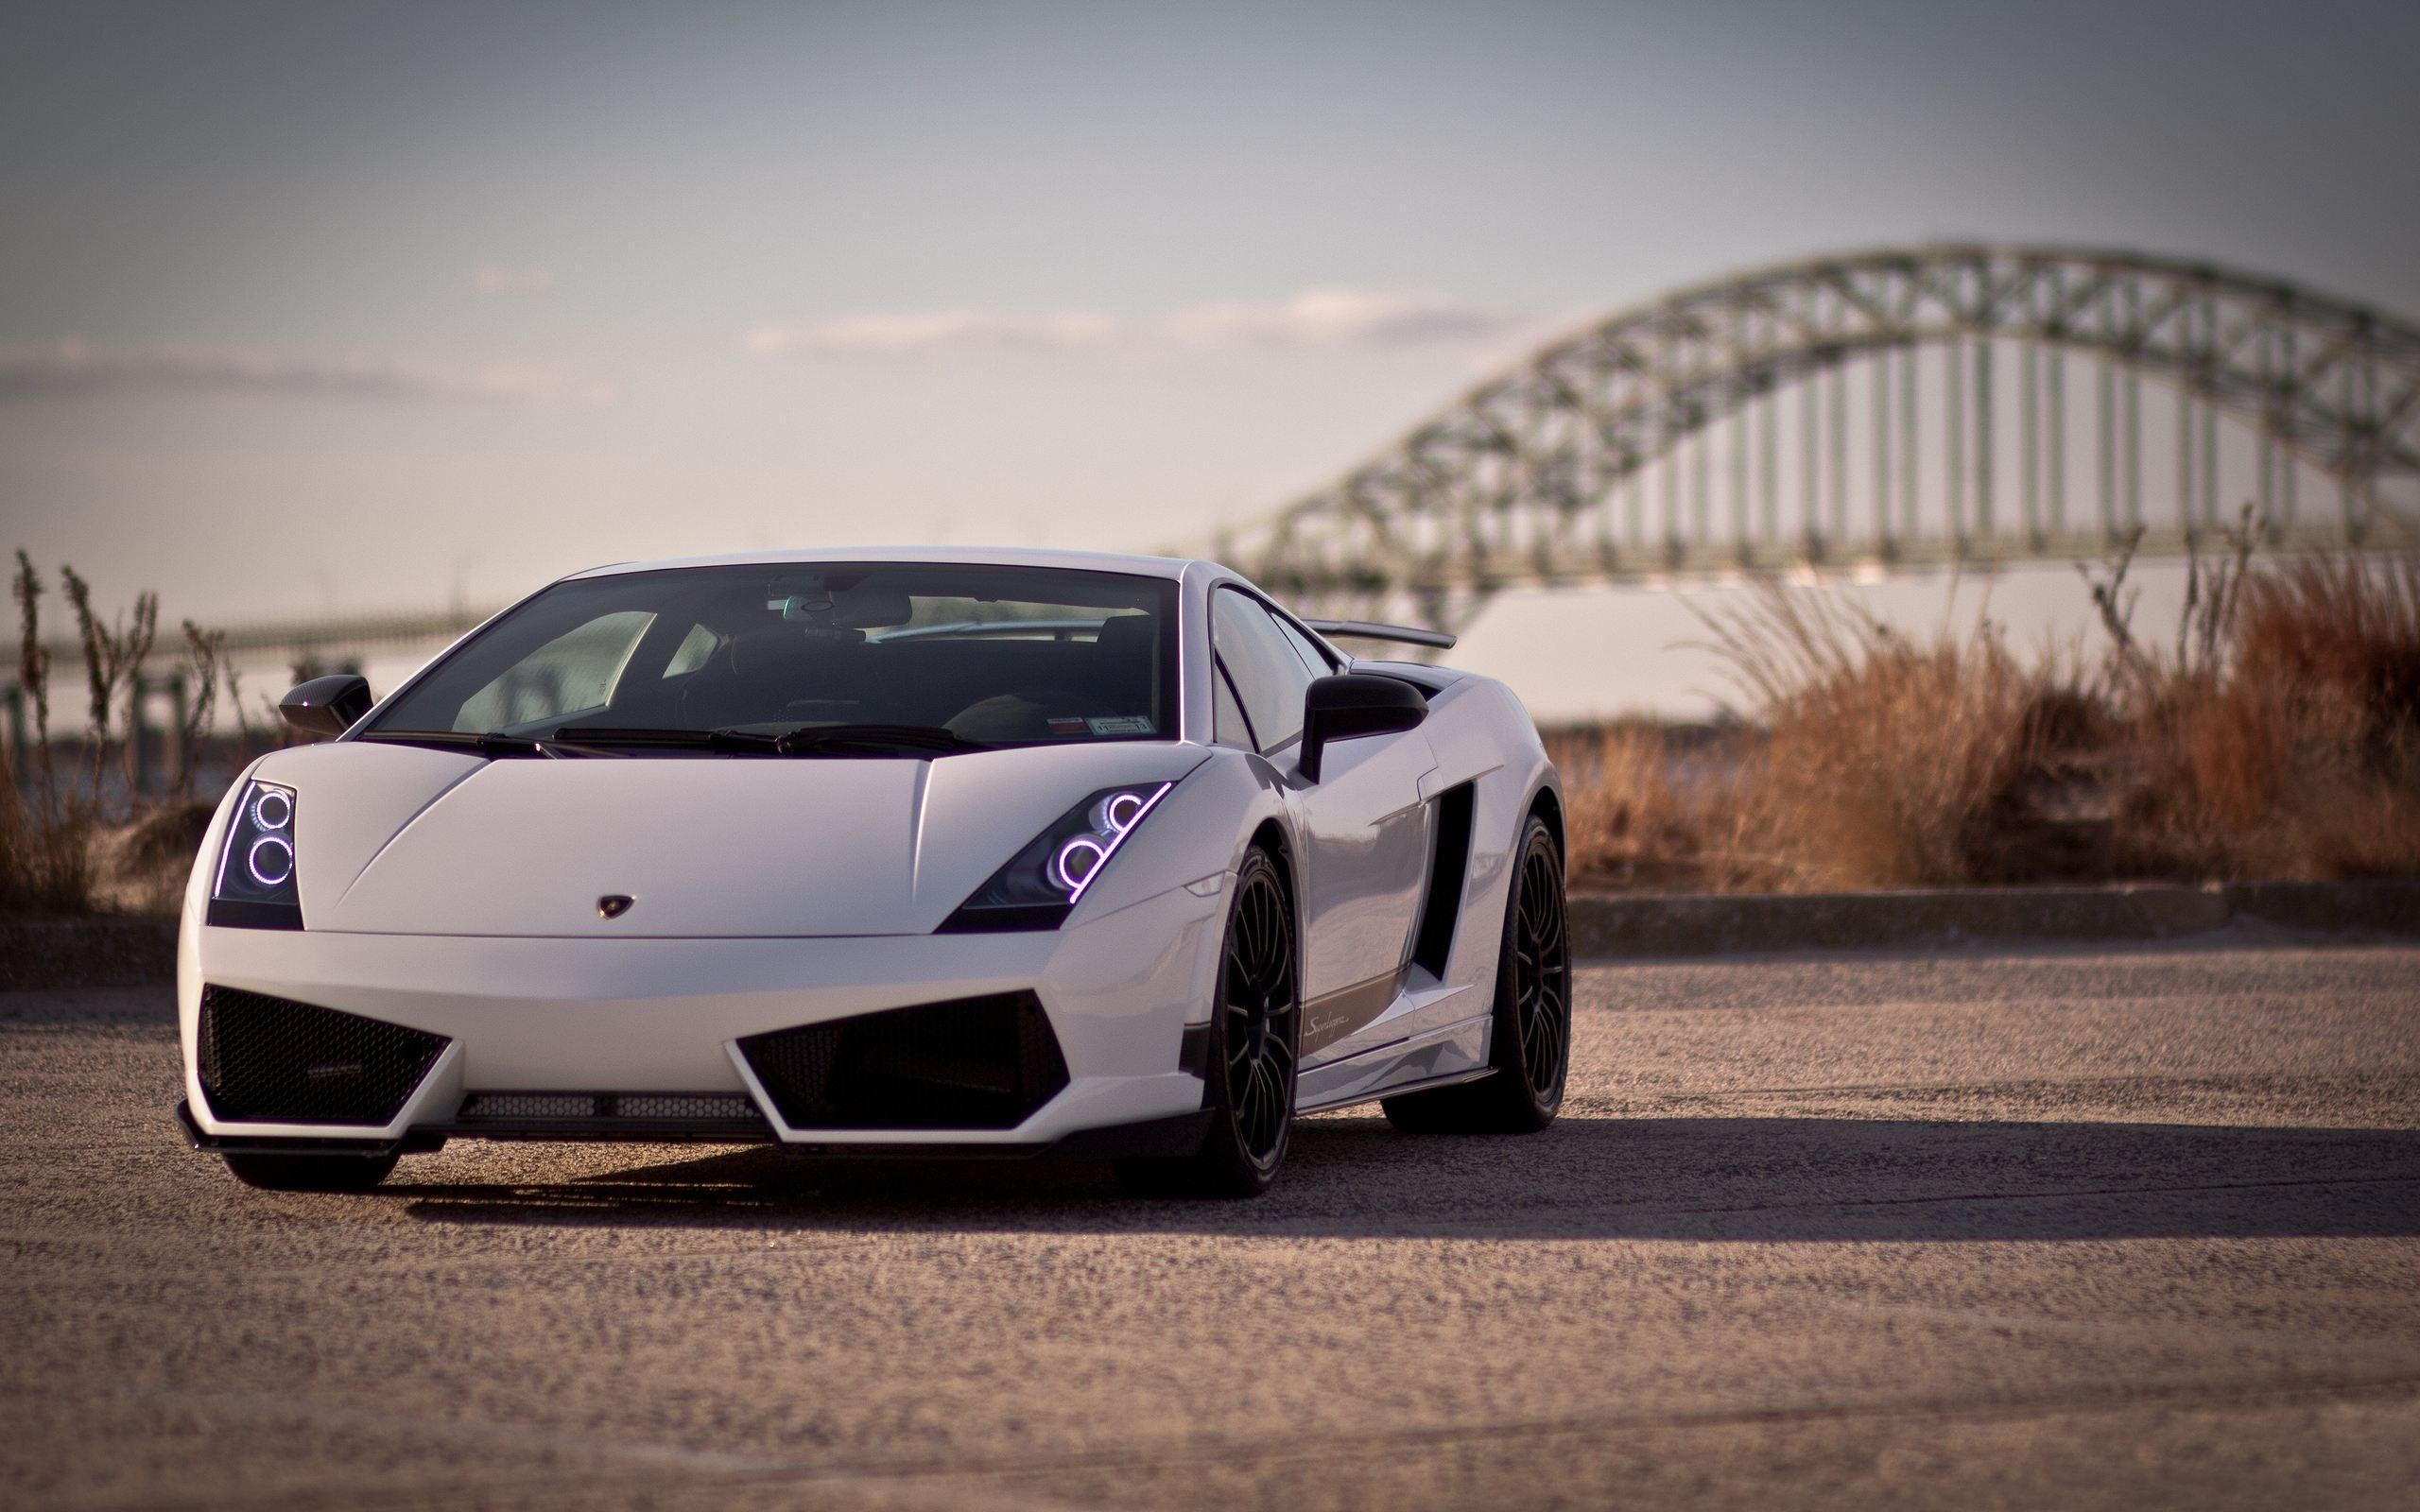 White Lamborghini Gallardo Wallpapers - Wallpaper CaveWhite Lamborghini Wallpaper